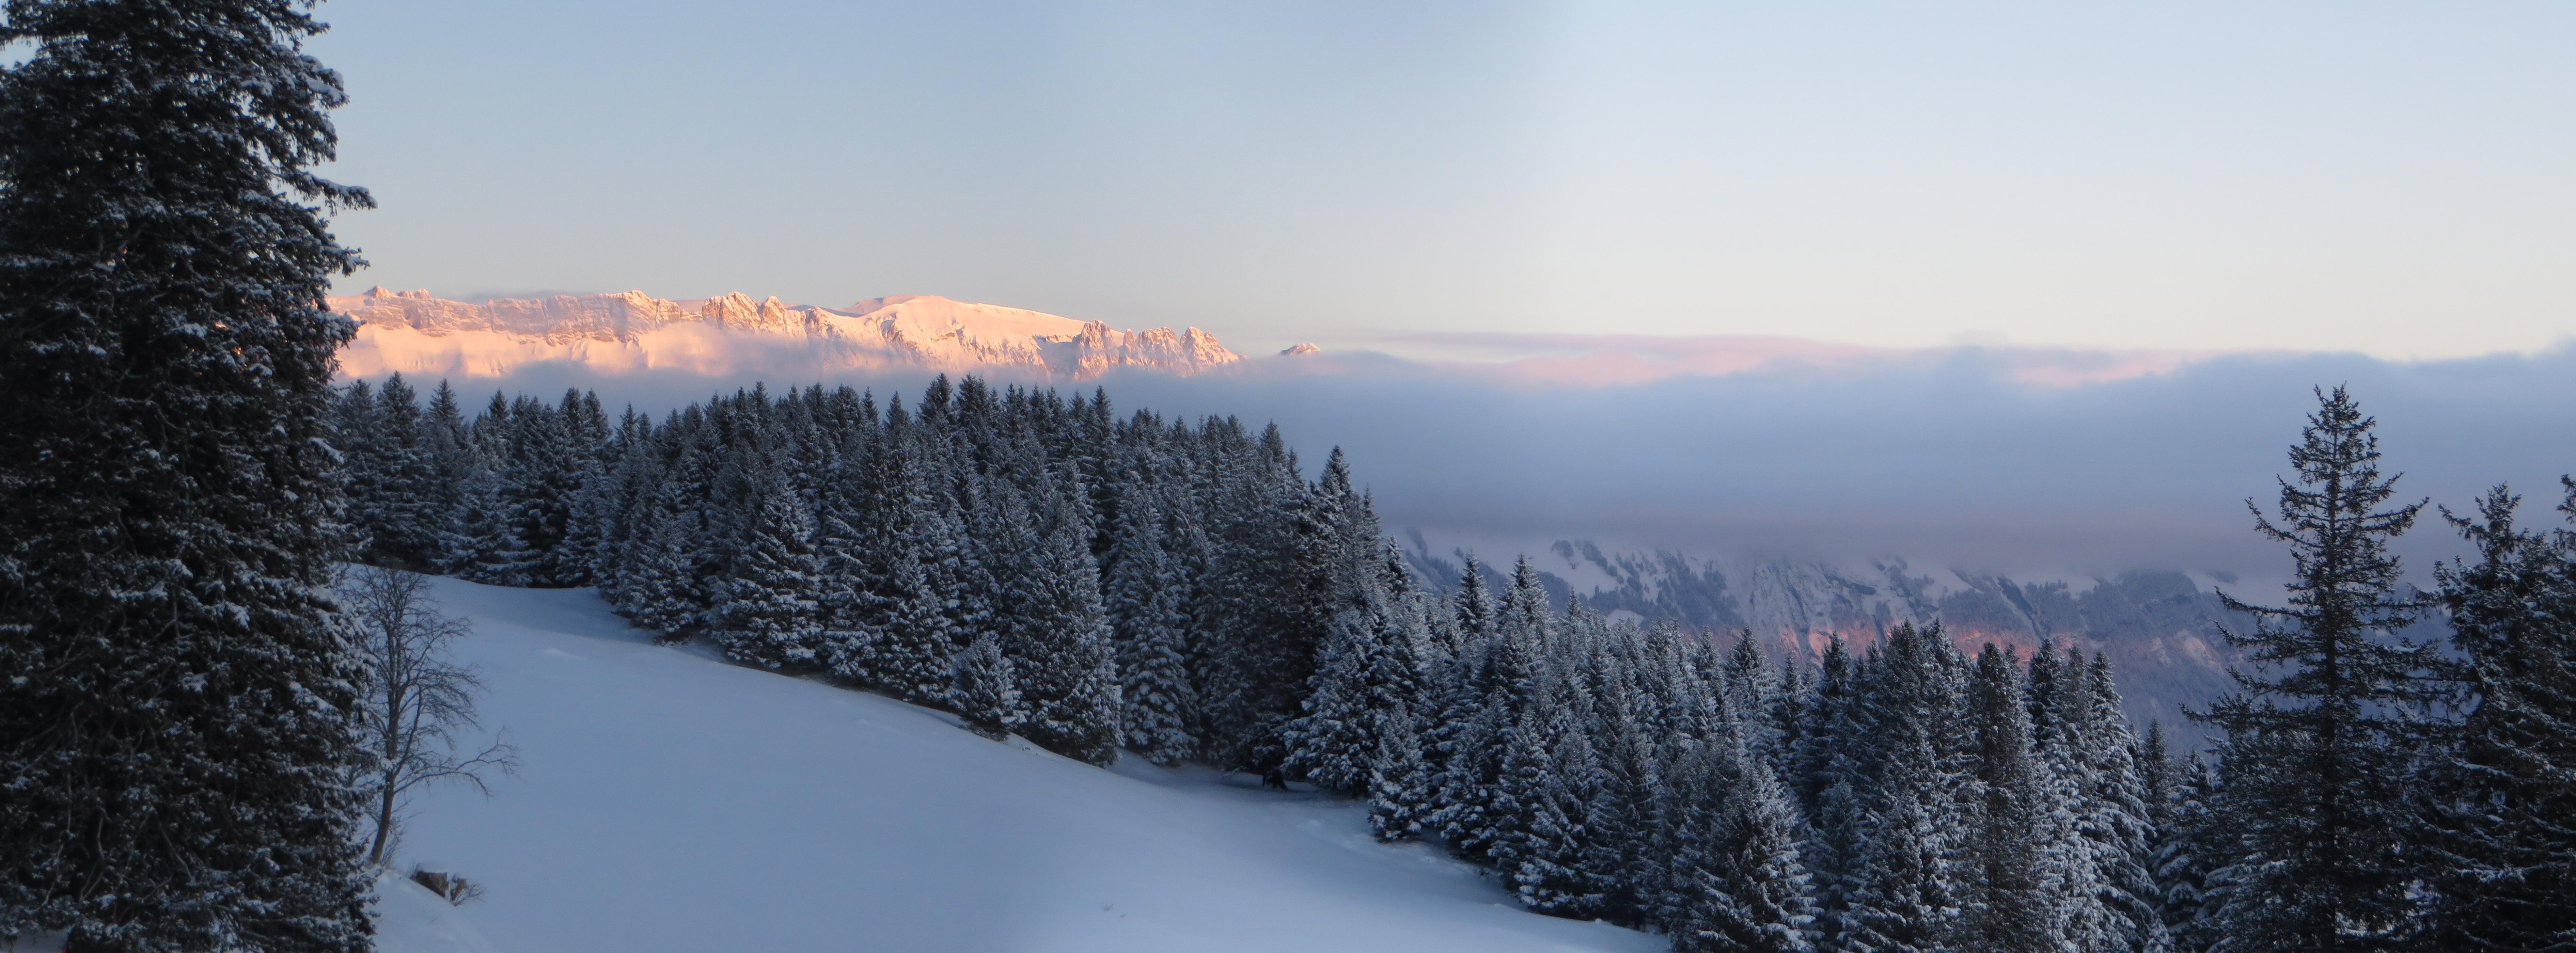 IMG_1587 Panorama